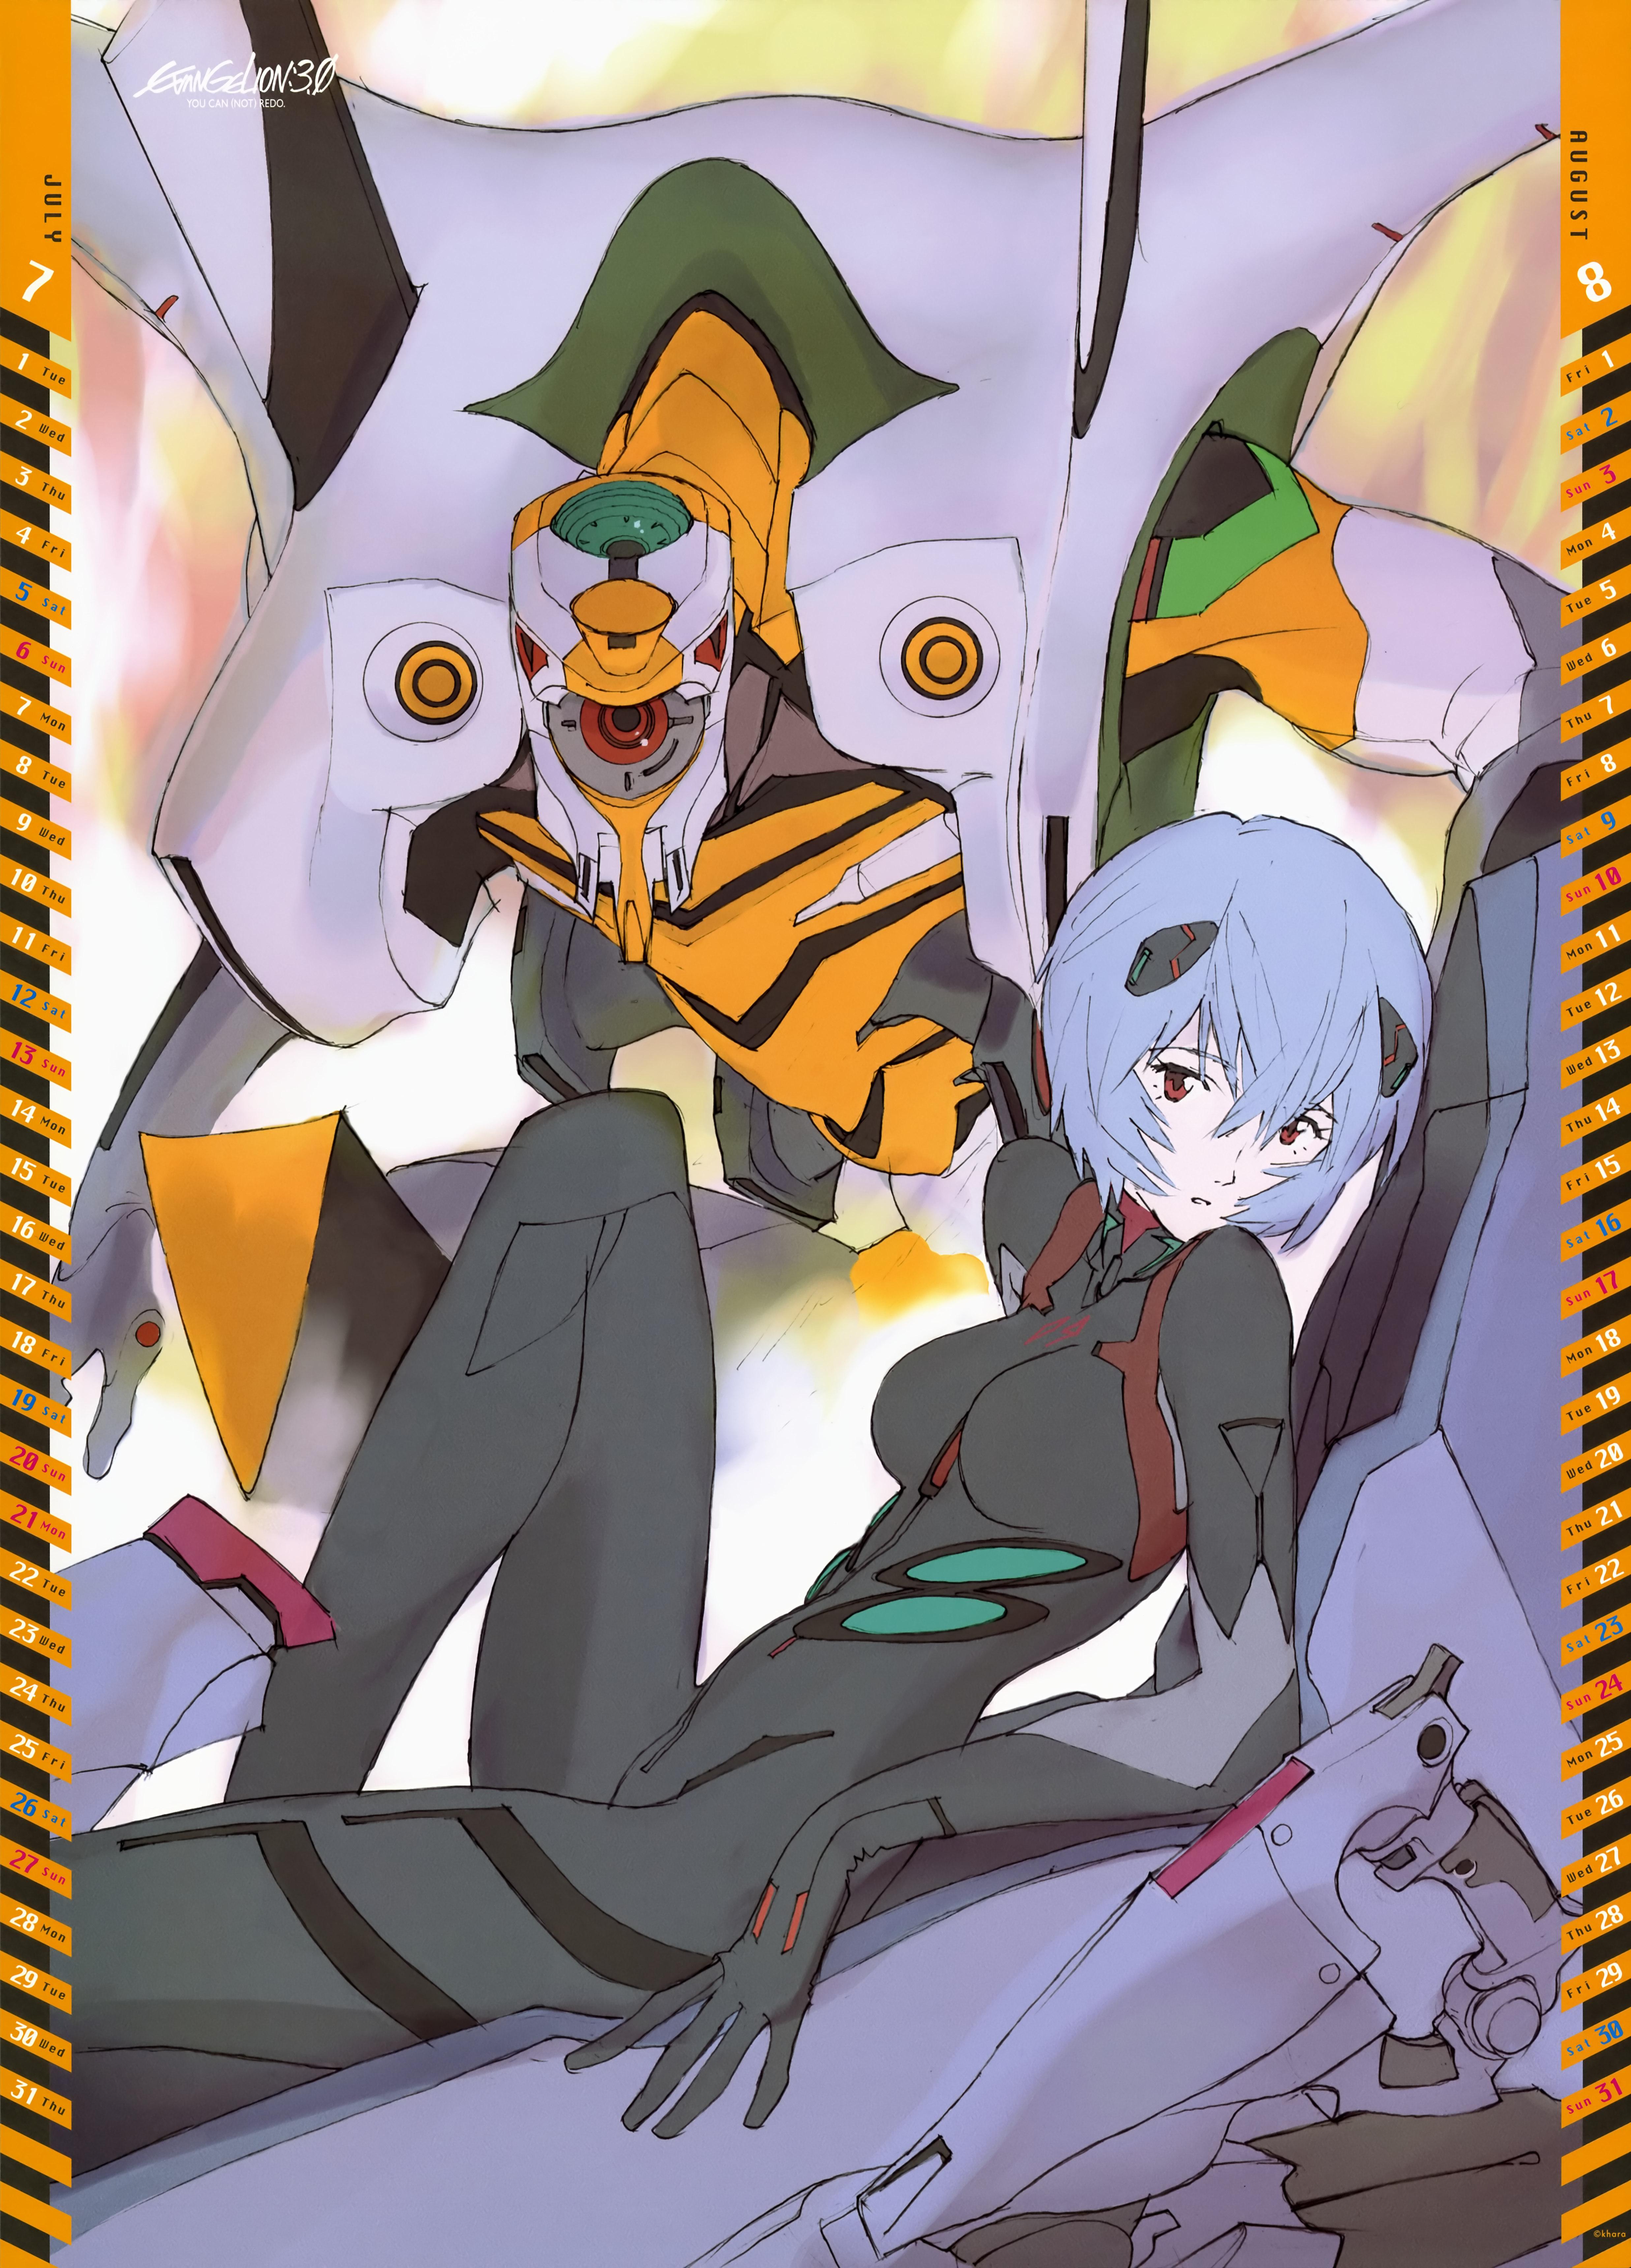 Neon Genesis Evangelion - Calendar: 2014 - Ik` Ilote 5